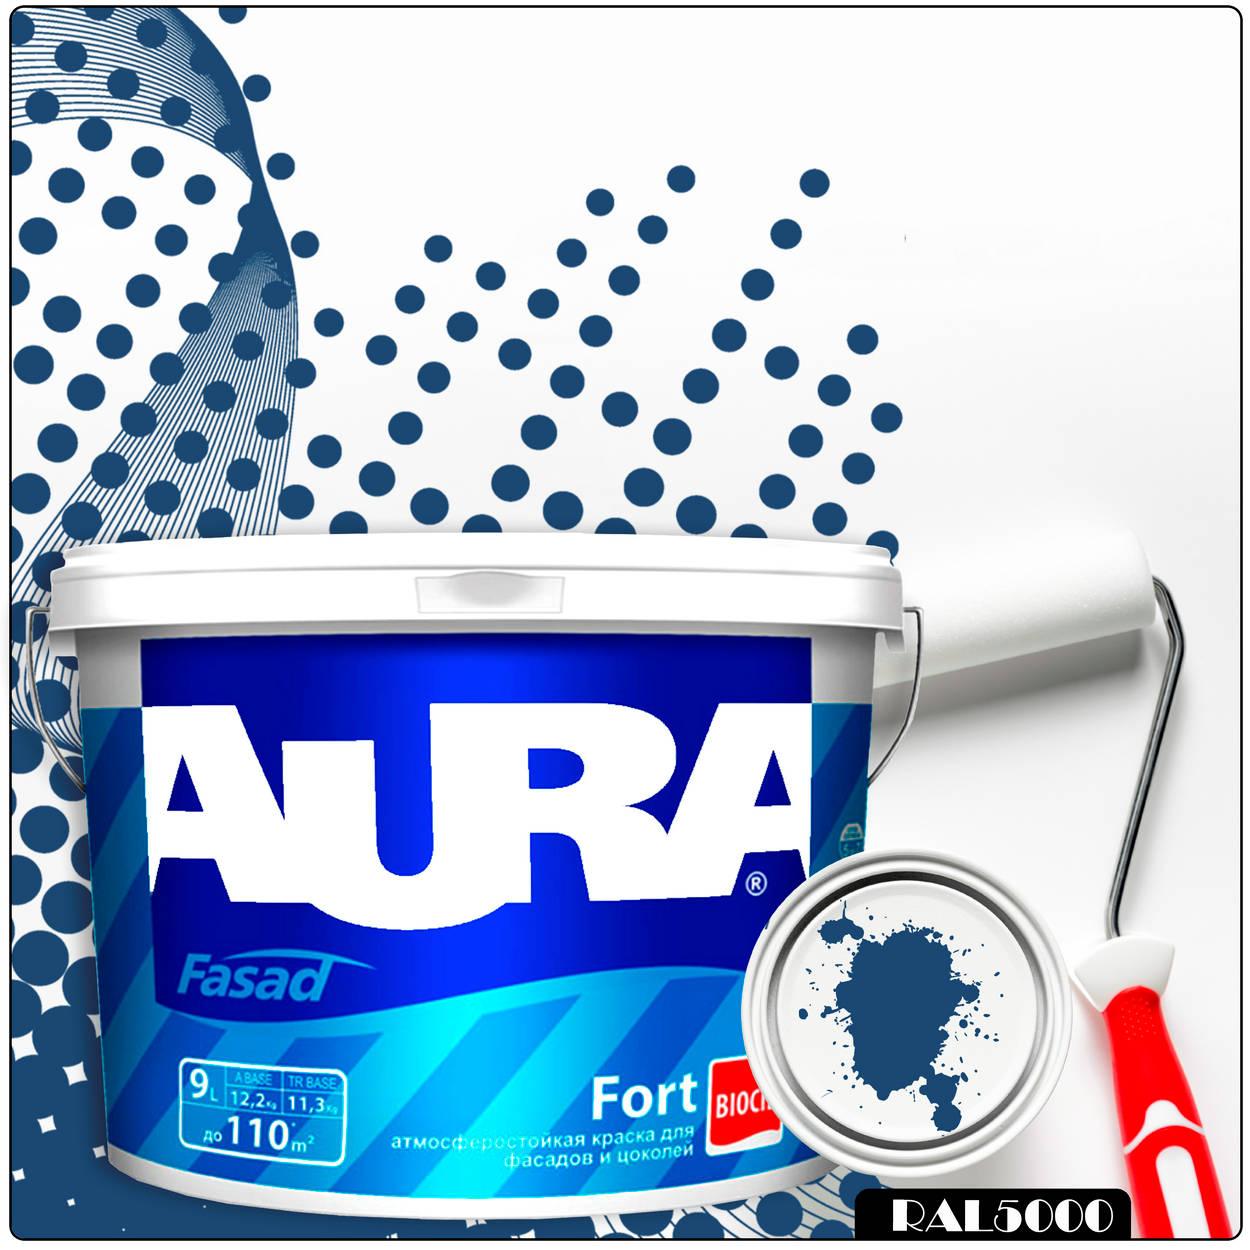 Фото 1 - Краска Aura Fasad Fort, RAL 5000 Фиолетово-синий, латексная, матовая, для фасада и цоколей, 9л, Аура.